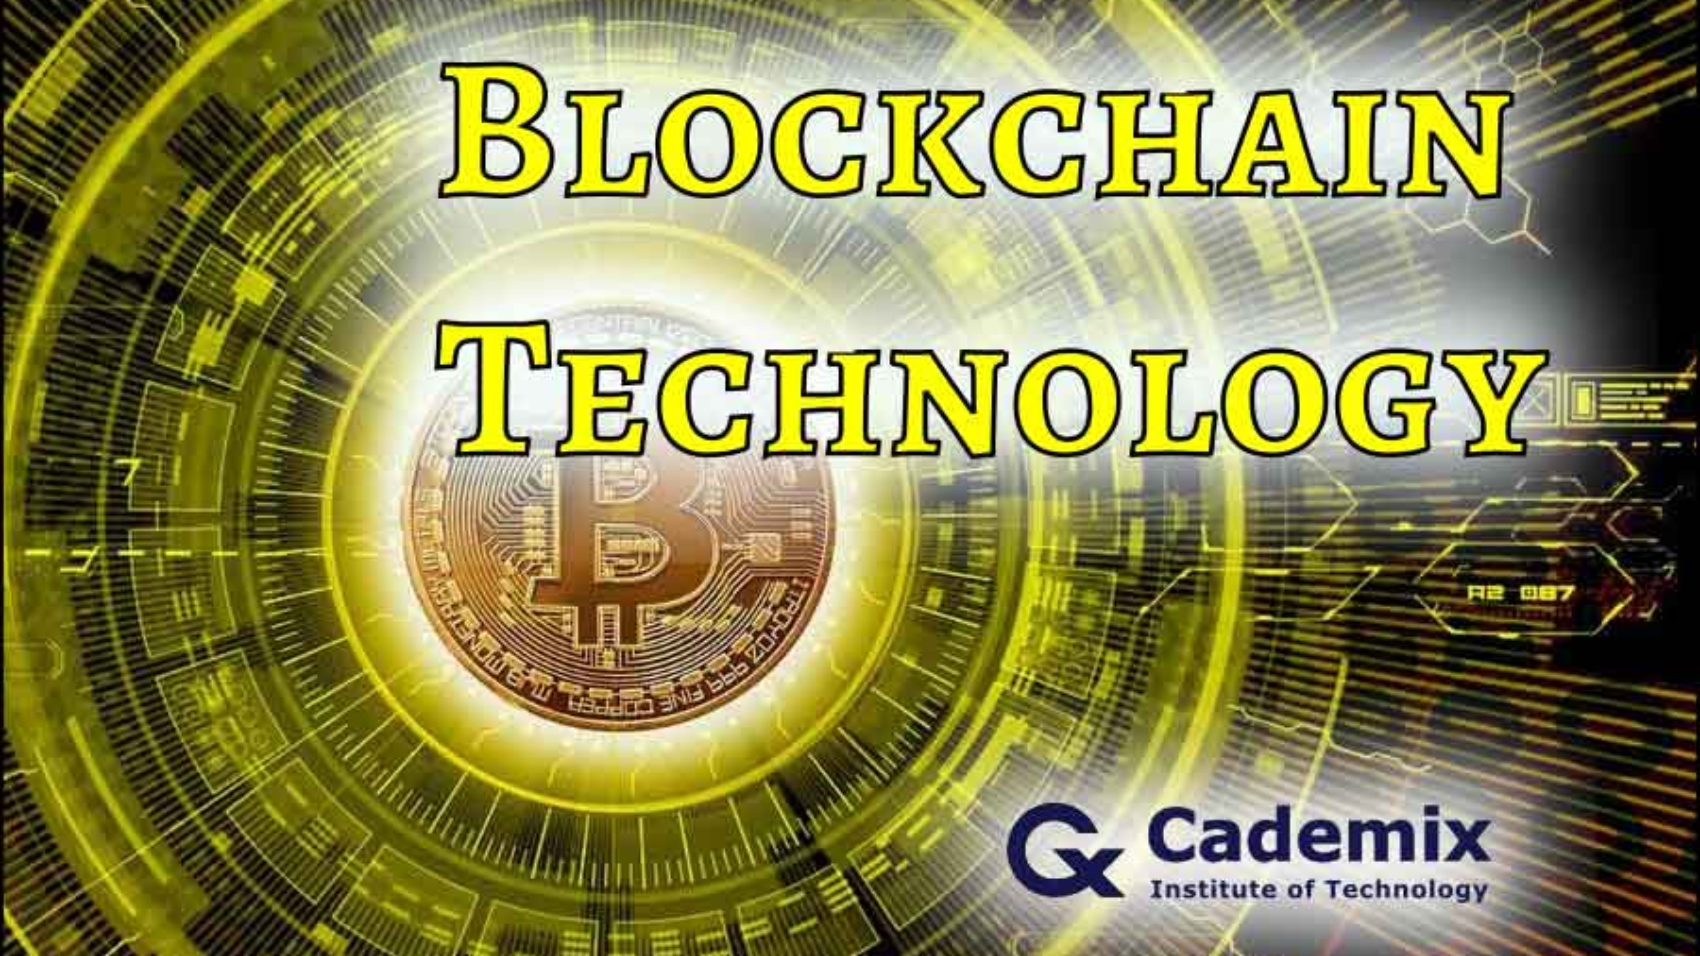 Blockchain as a Service BaaS Technology Priyanka Porkute Article Cademix